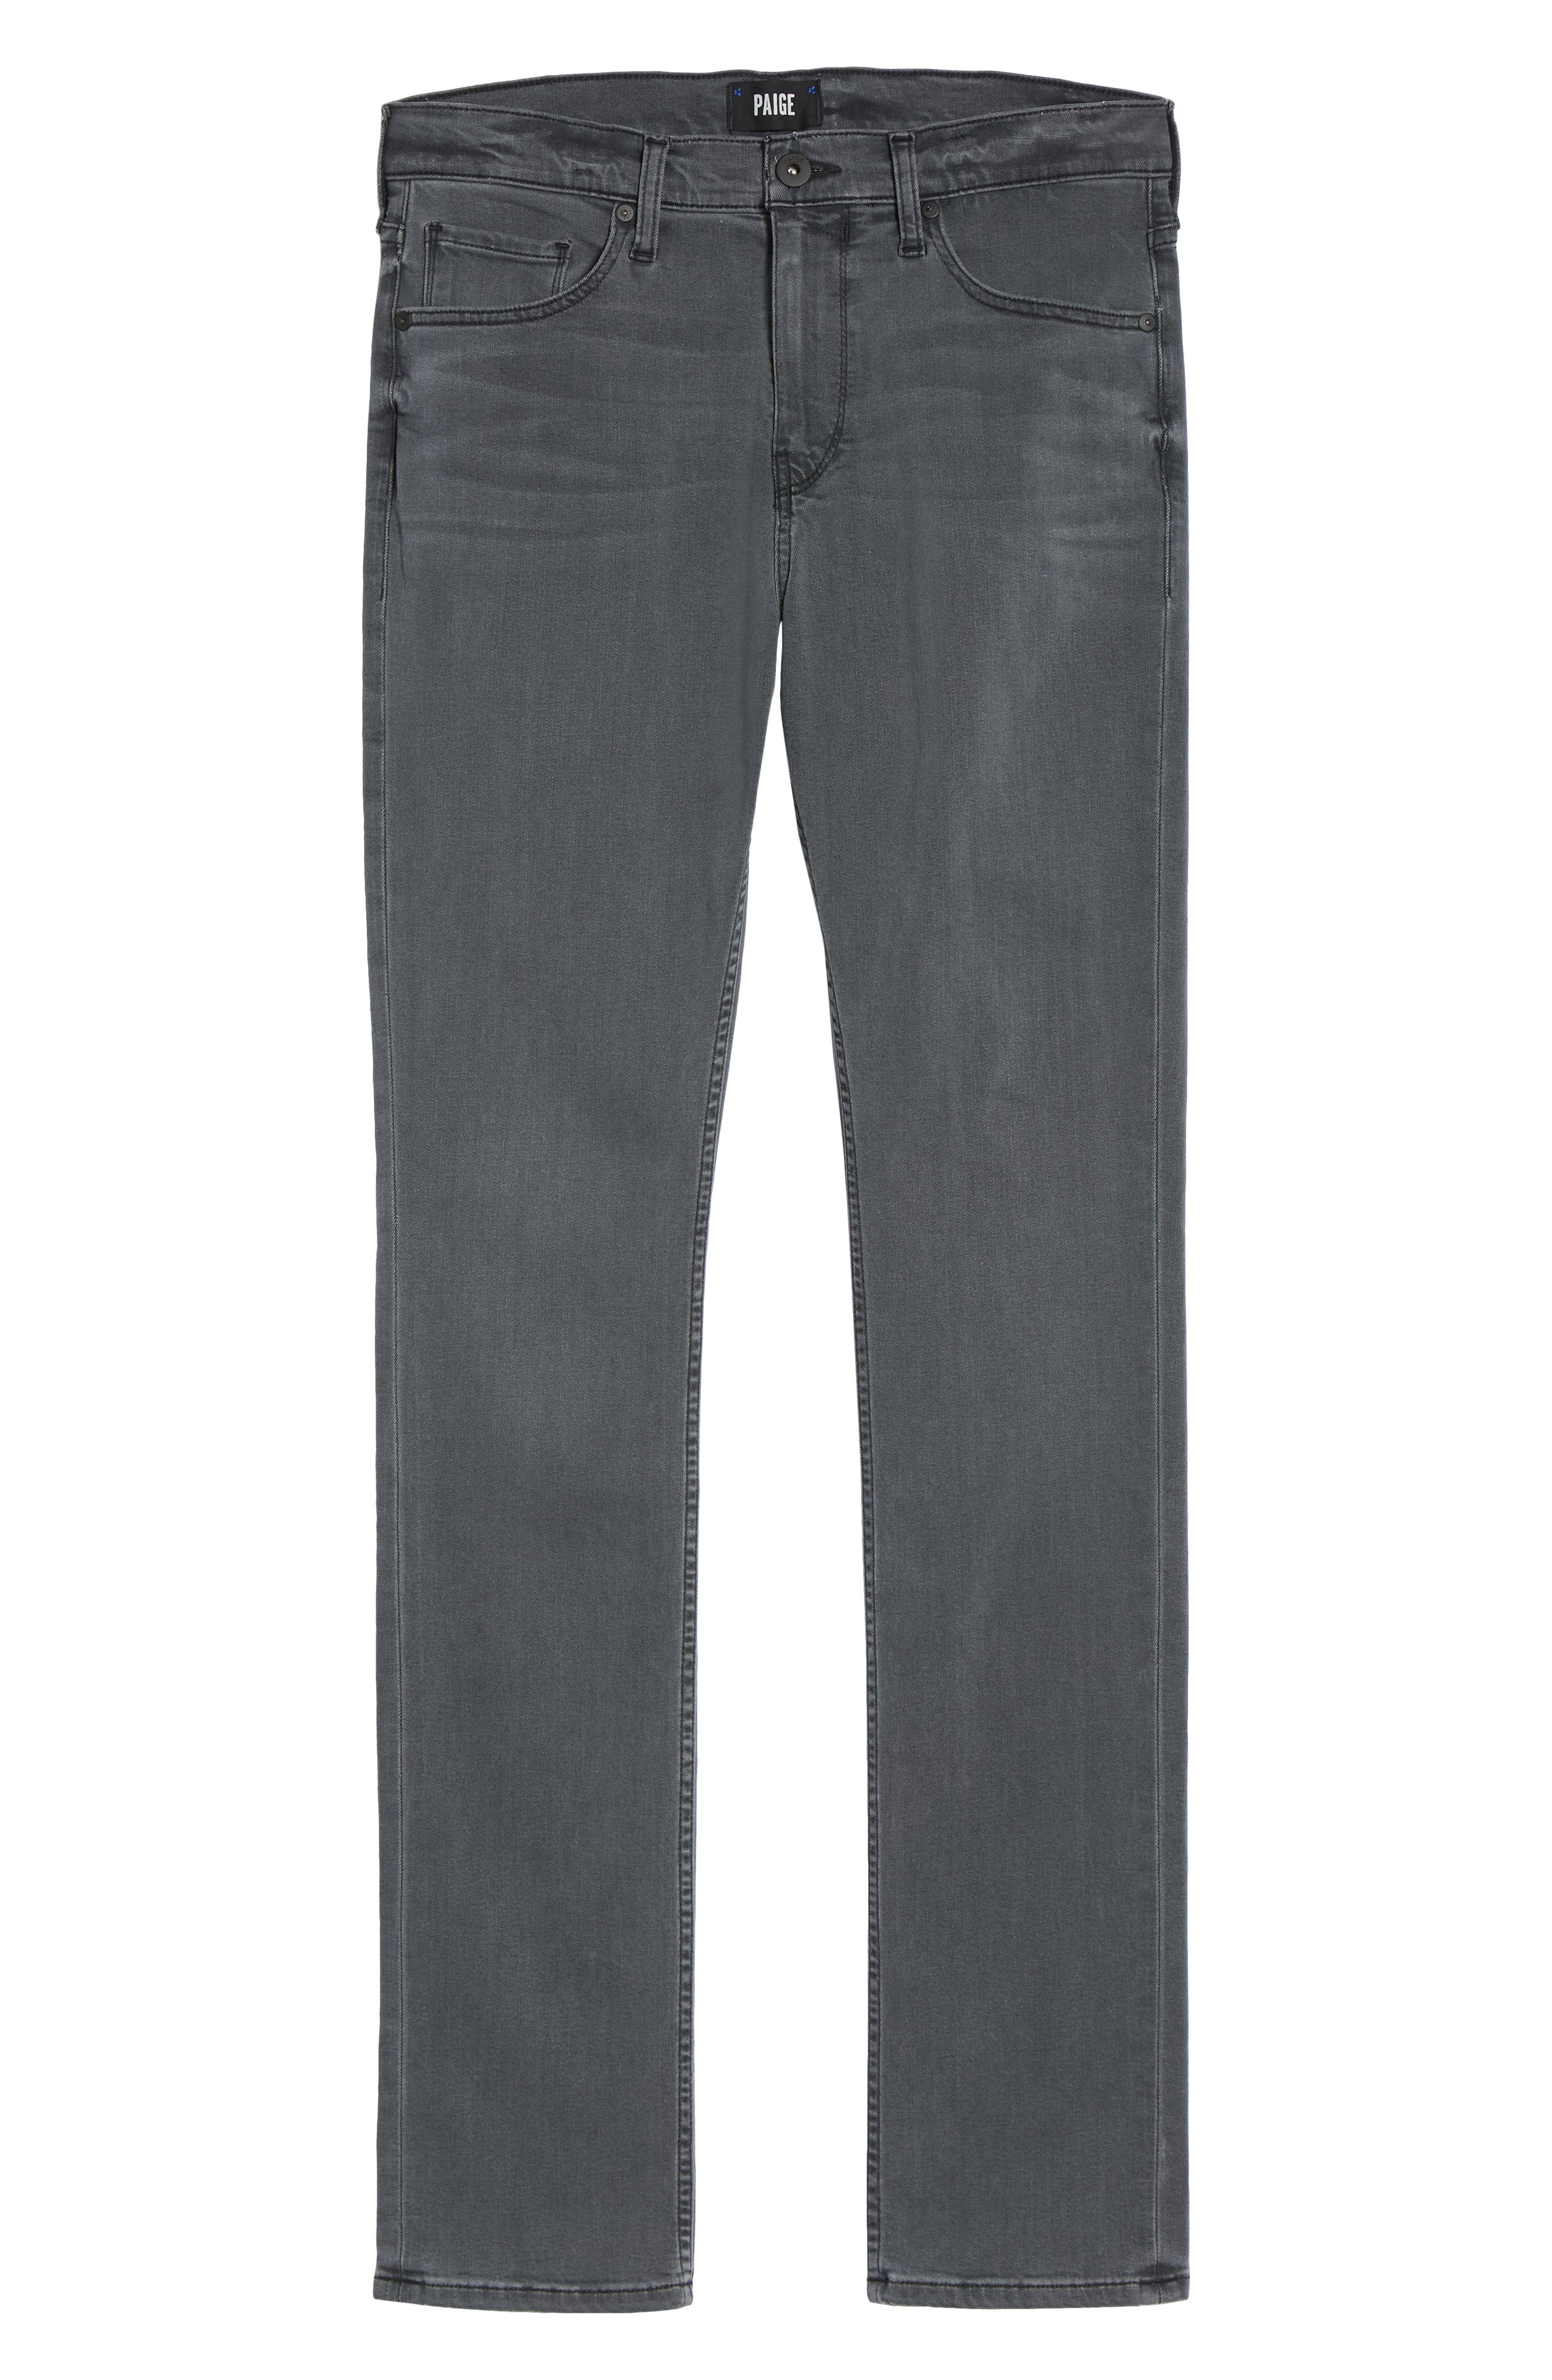 Federal Slim Straight Leg Jeans,                             Alternate thumbnail 6, color,                             020